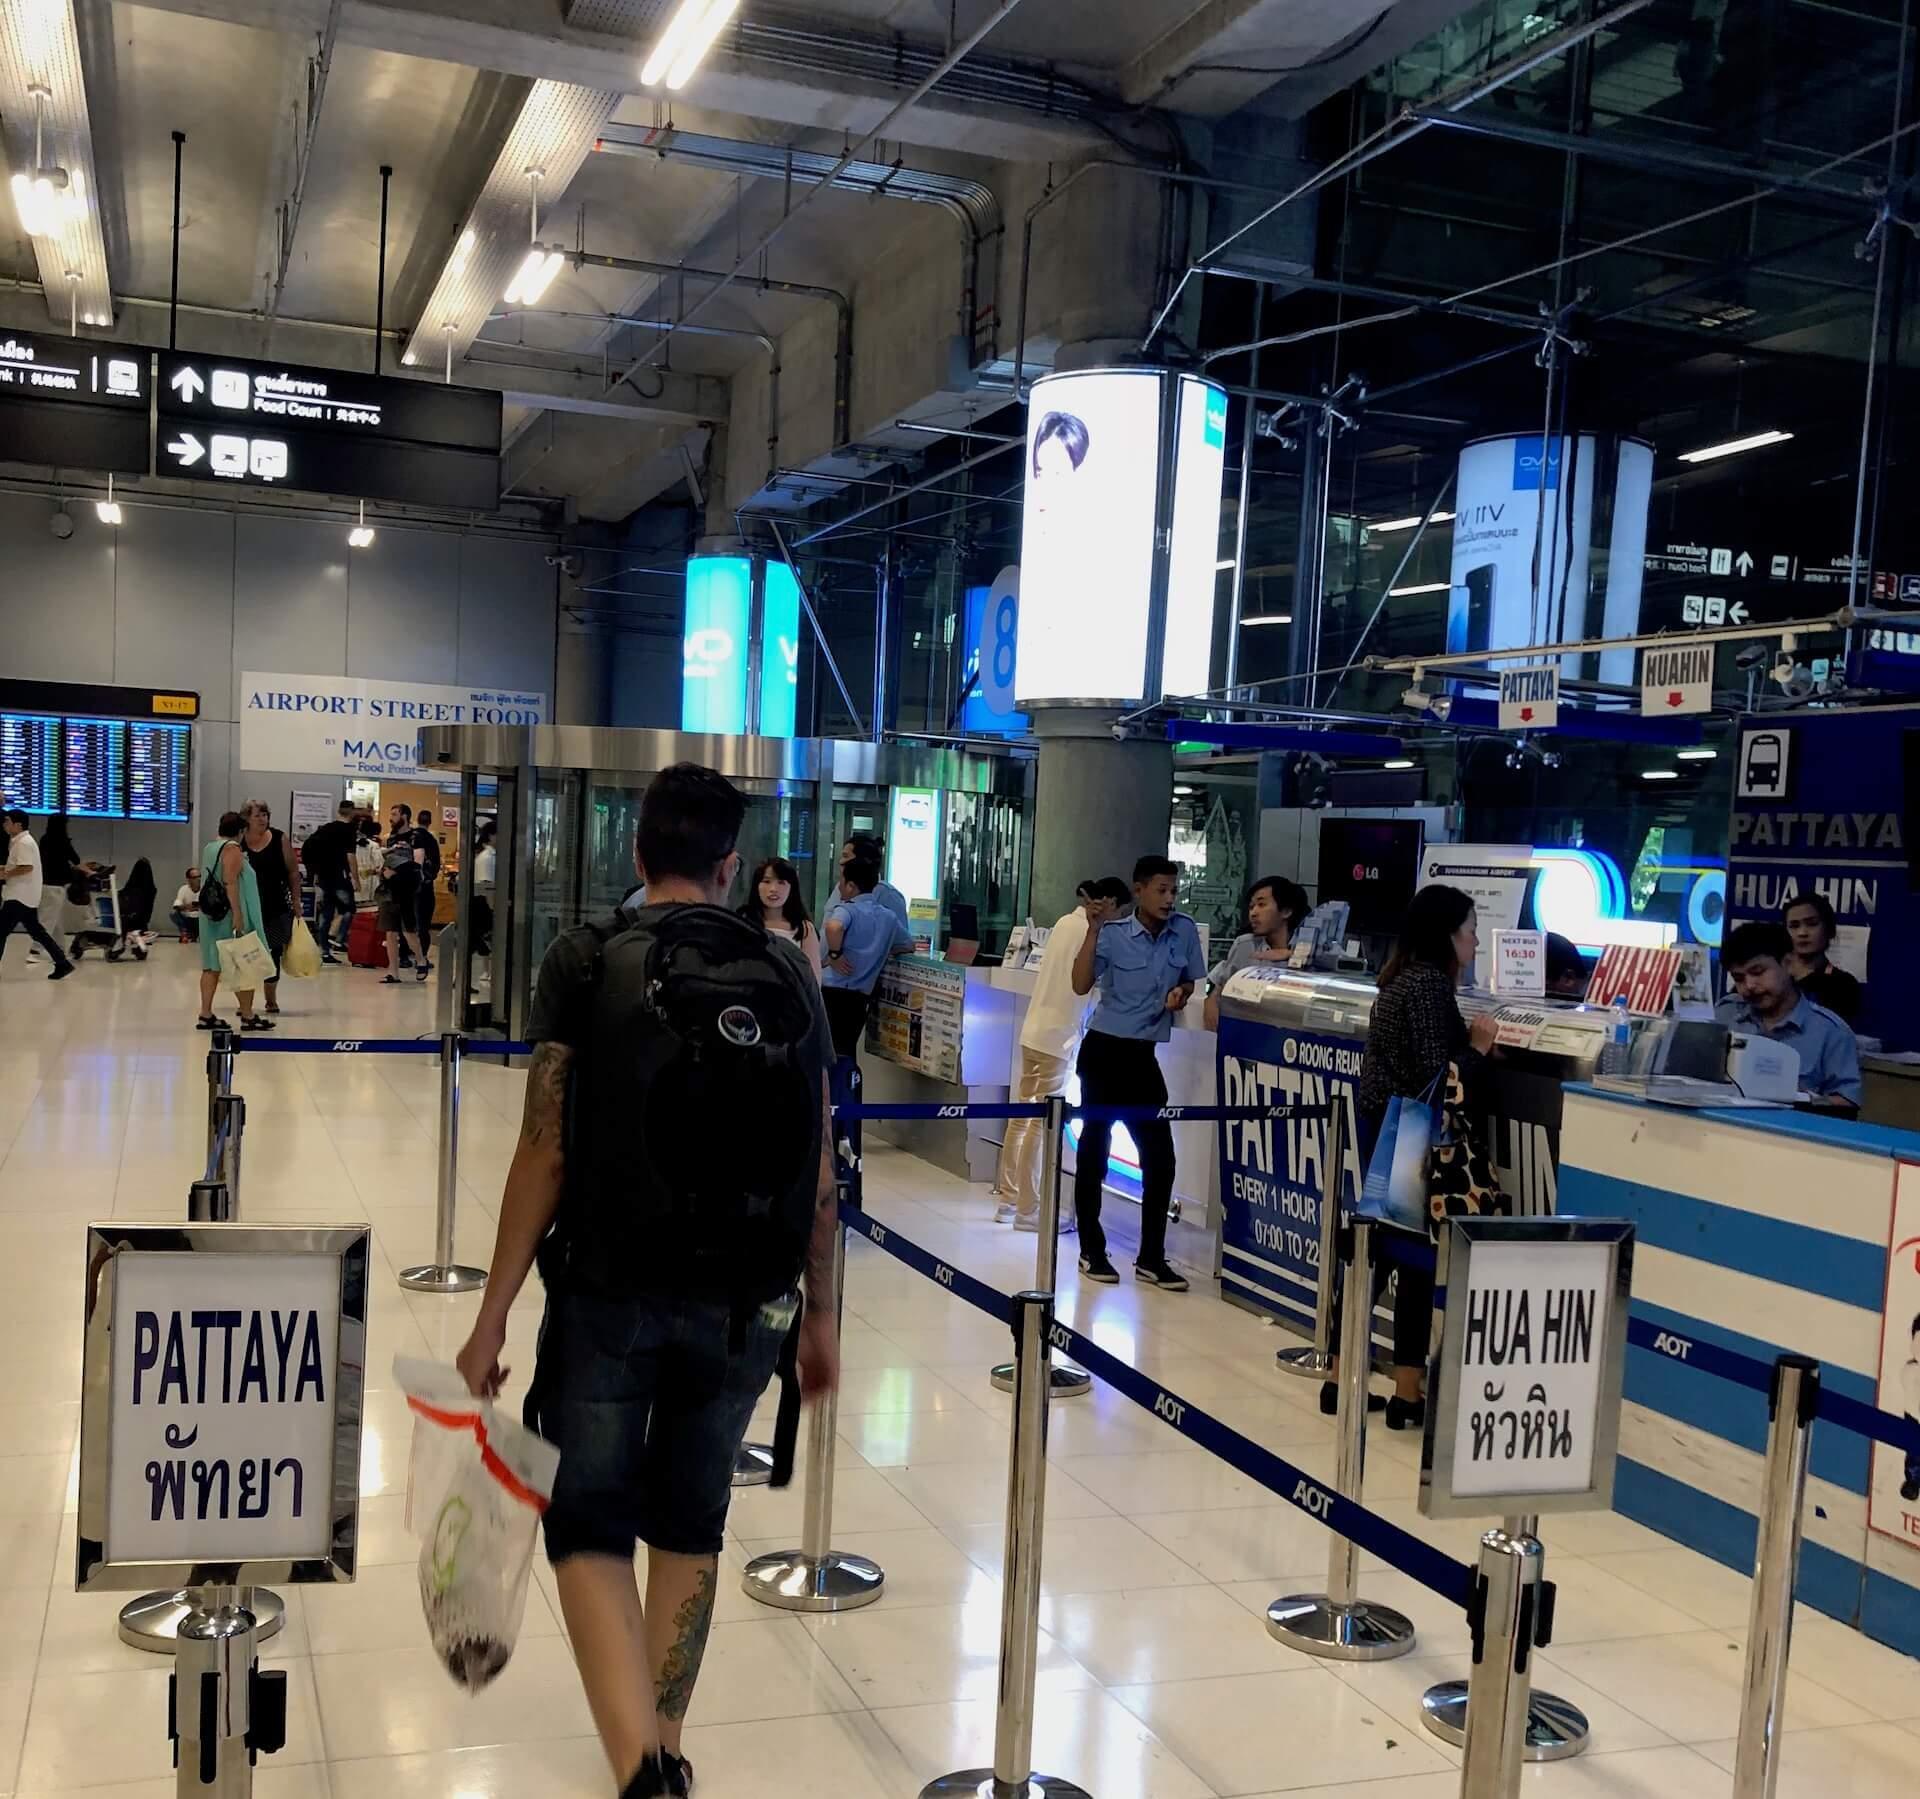 Flughafen Bangkok nach Pattaya Airport Bus Ticket Counter